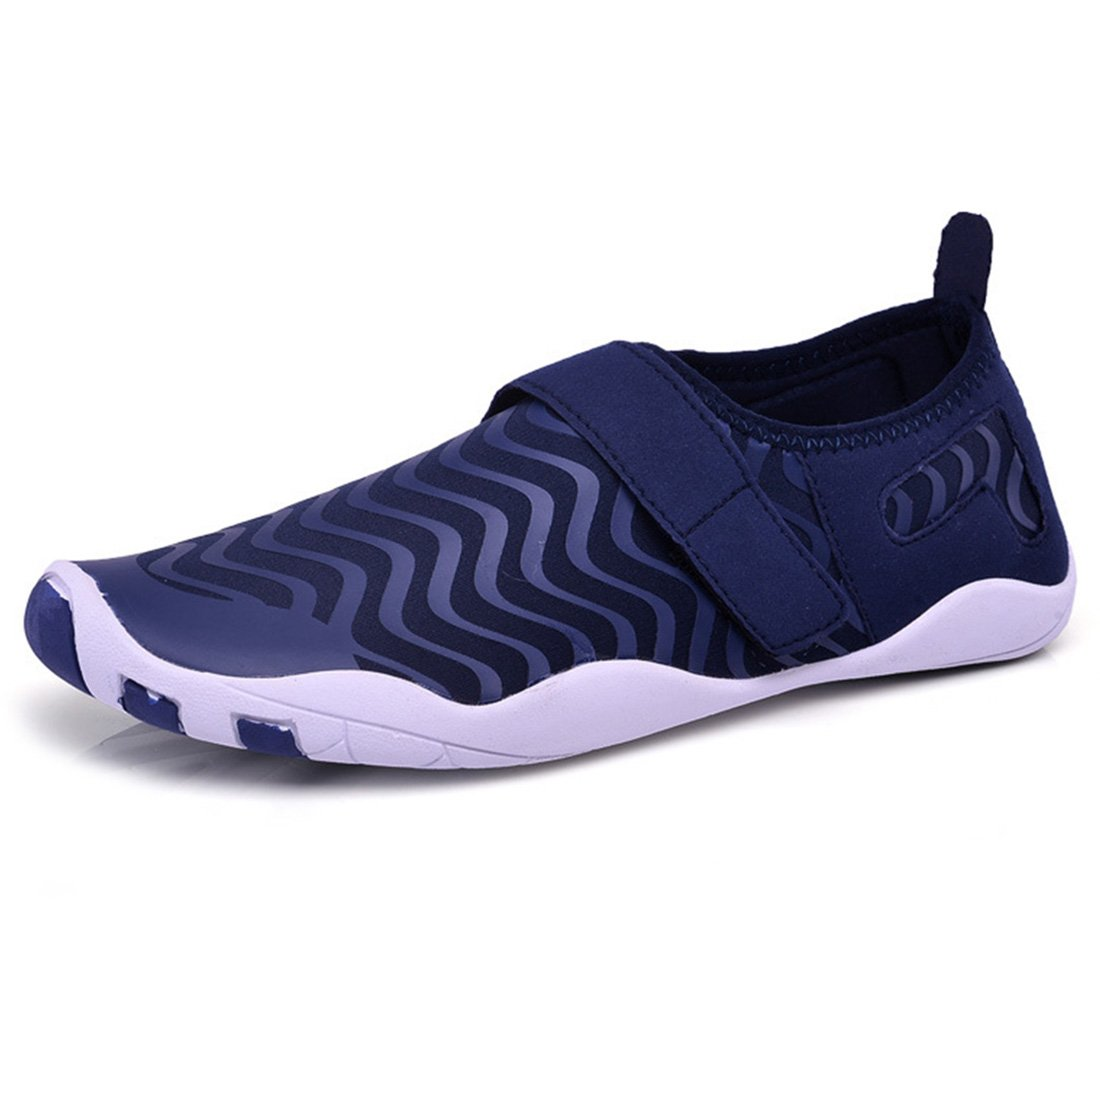 39e93f9f5a0a Water Shoes Quick Dry Aqua Aqua Aqua Shoes Barefoot Shoes for Water Sports  Rubber Sole B07DMFS7HQ EU Size 40(US Size Men 7.5  Women 8)